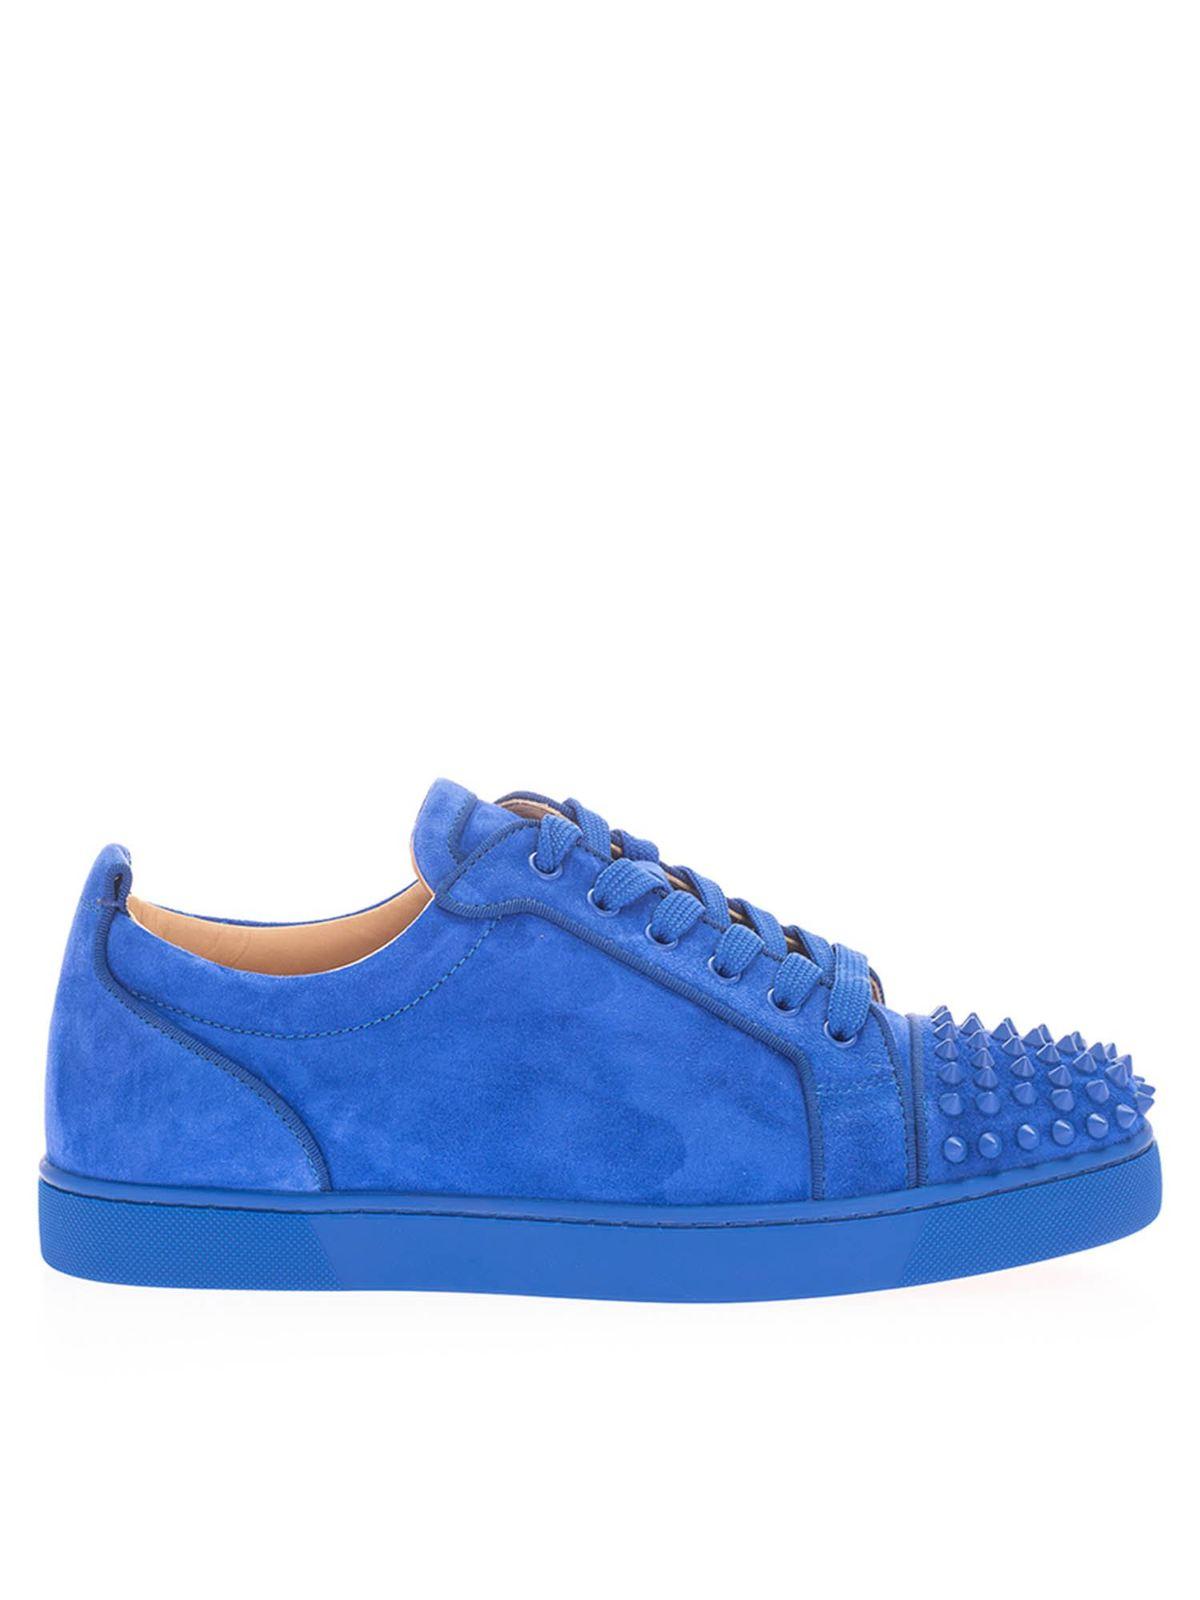 Christian Louboutin Sneakers JUNIOR SPIKES ORLATO SNEAKERS IN ELECTRIC BLU